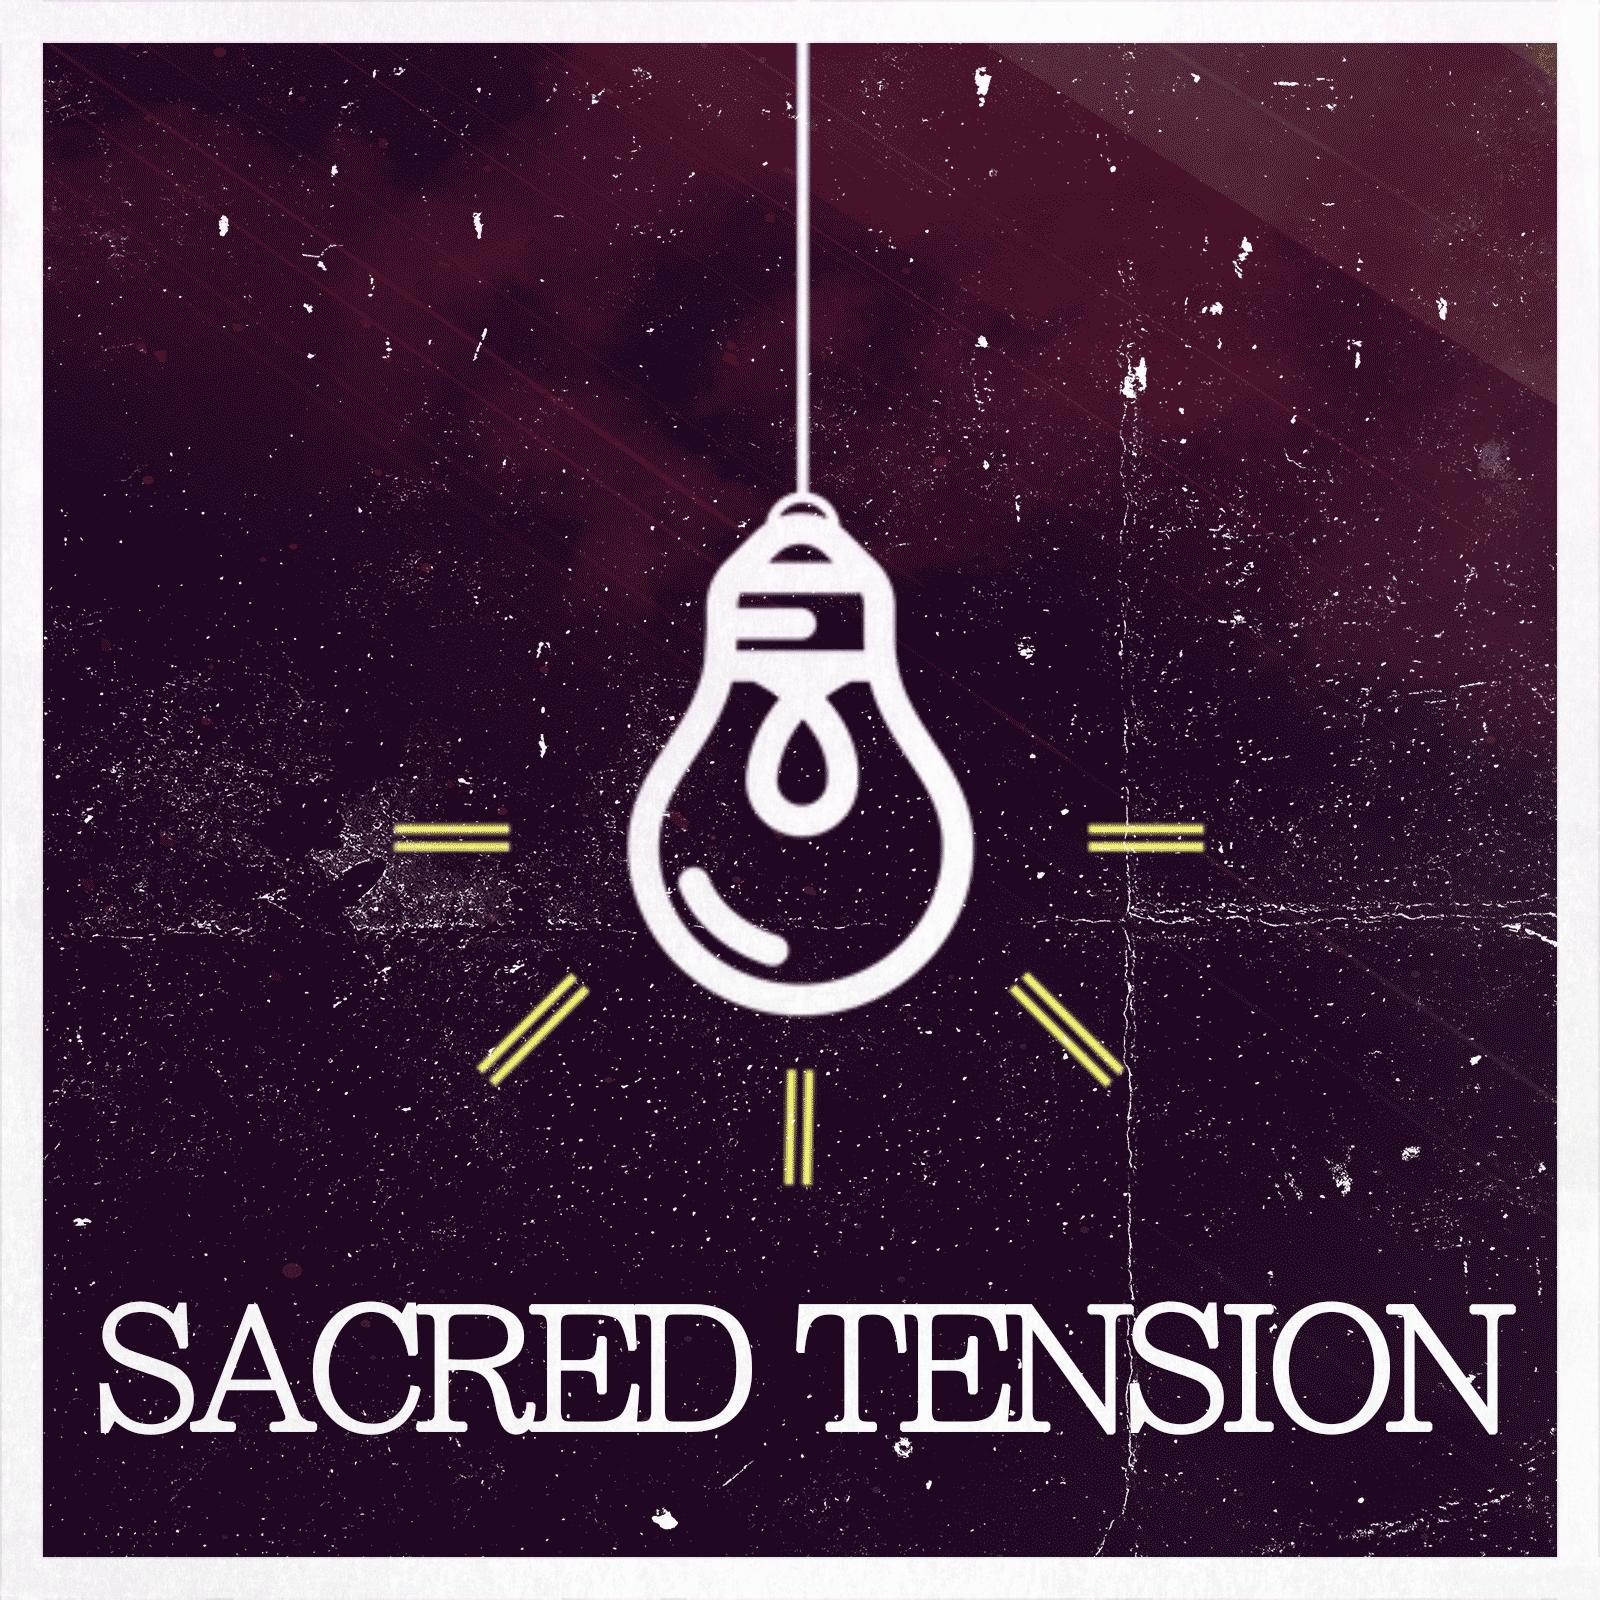 SacredTensionLogo3